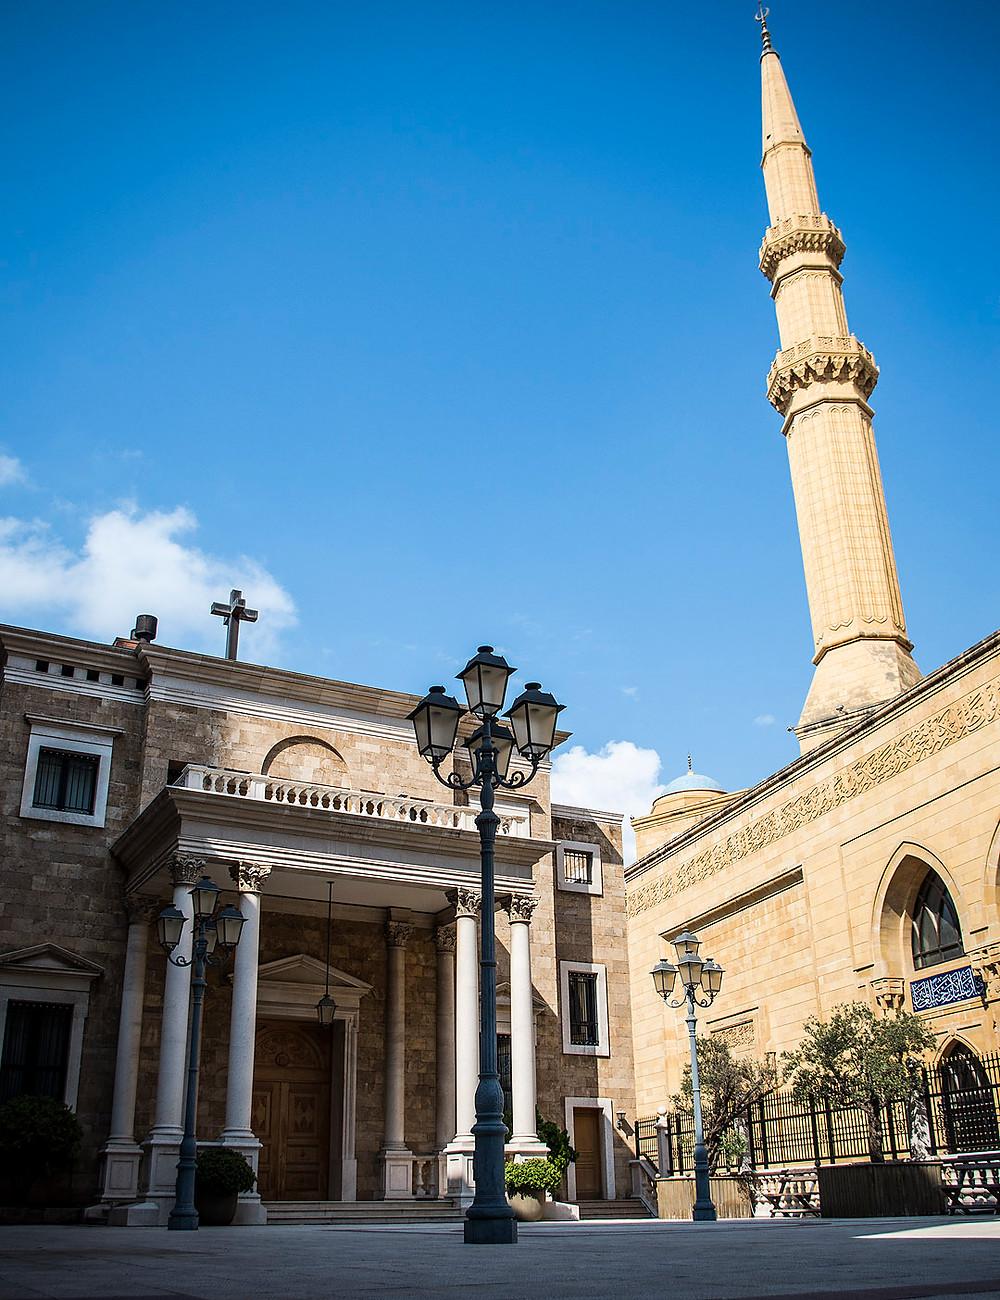 Maronite Cathedral of Saint George